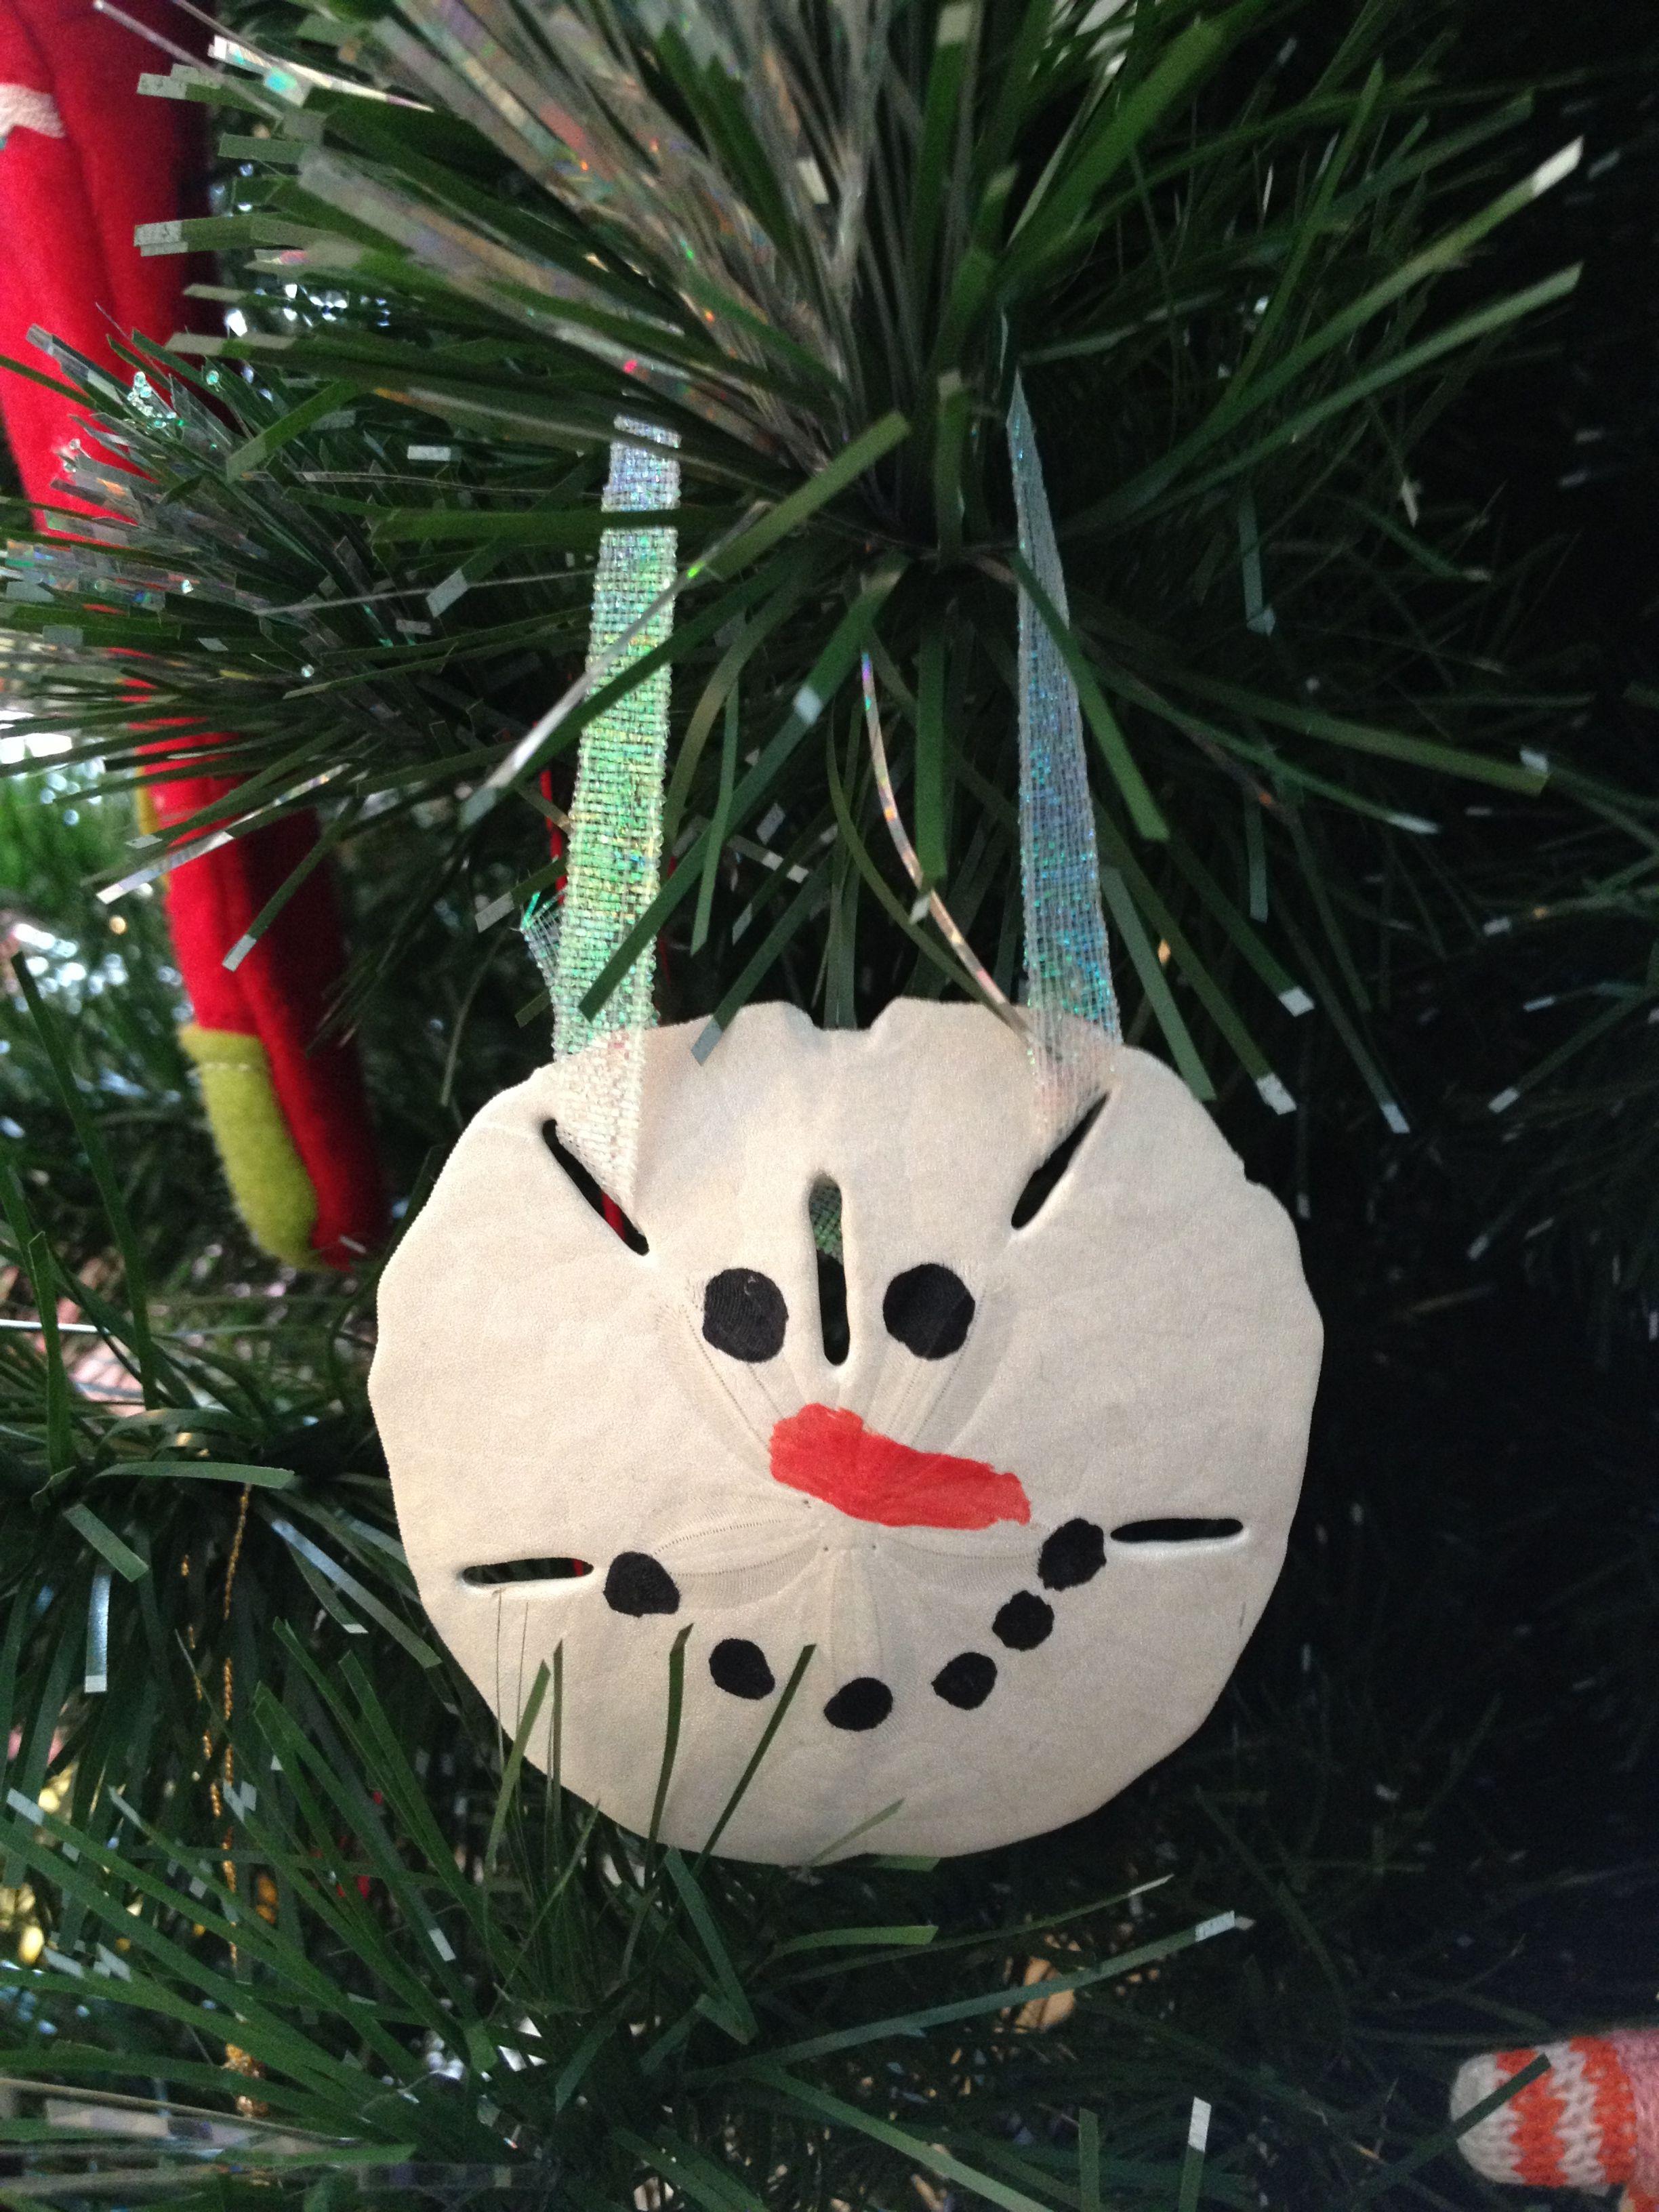 Sand dollar ornament - Snowman Sand Dollar Ornament